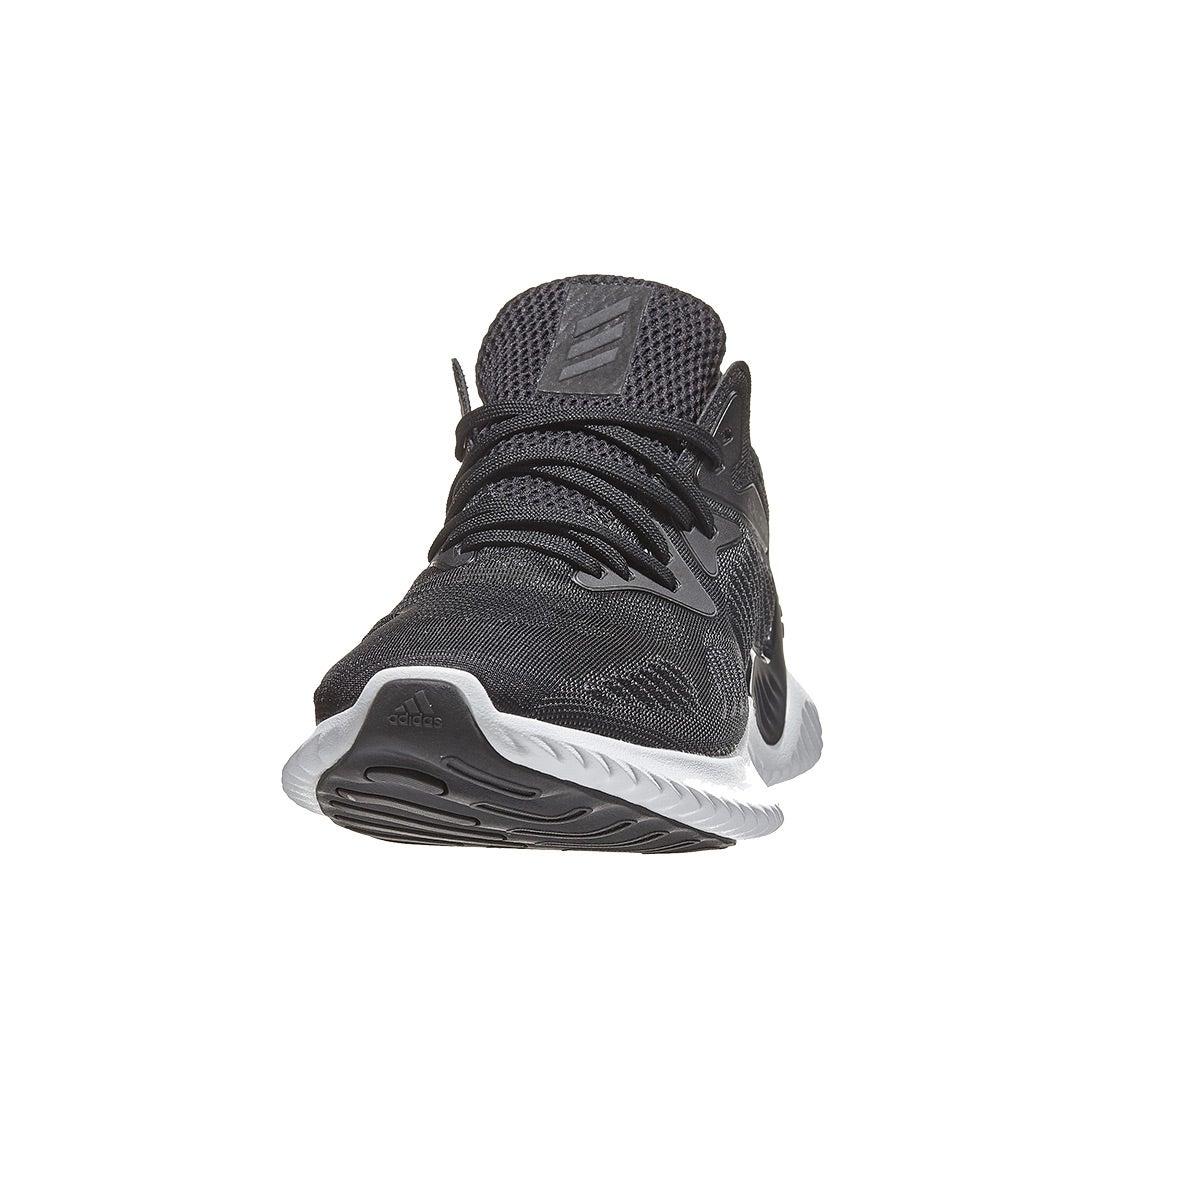 adidas Alphabounce Beyond Trainer Bk/Wh Men's Shoe 360° View